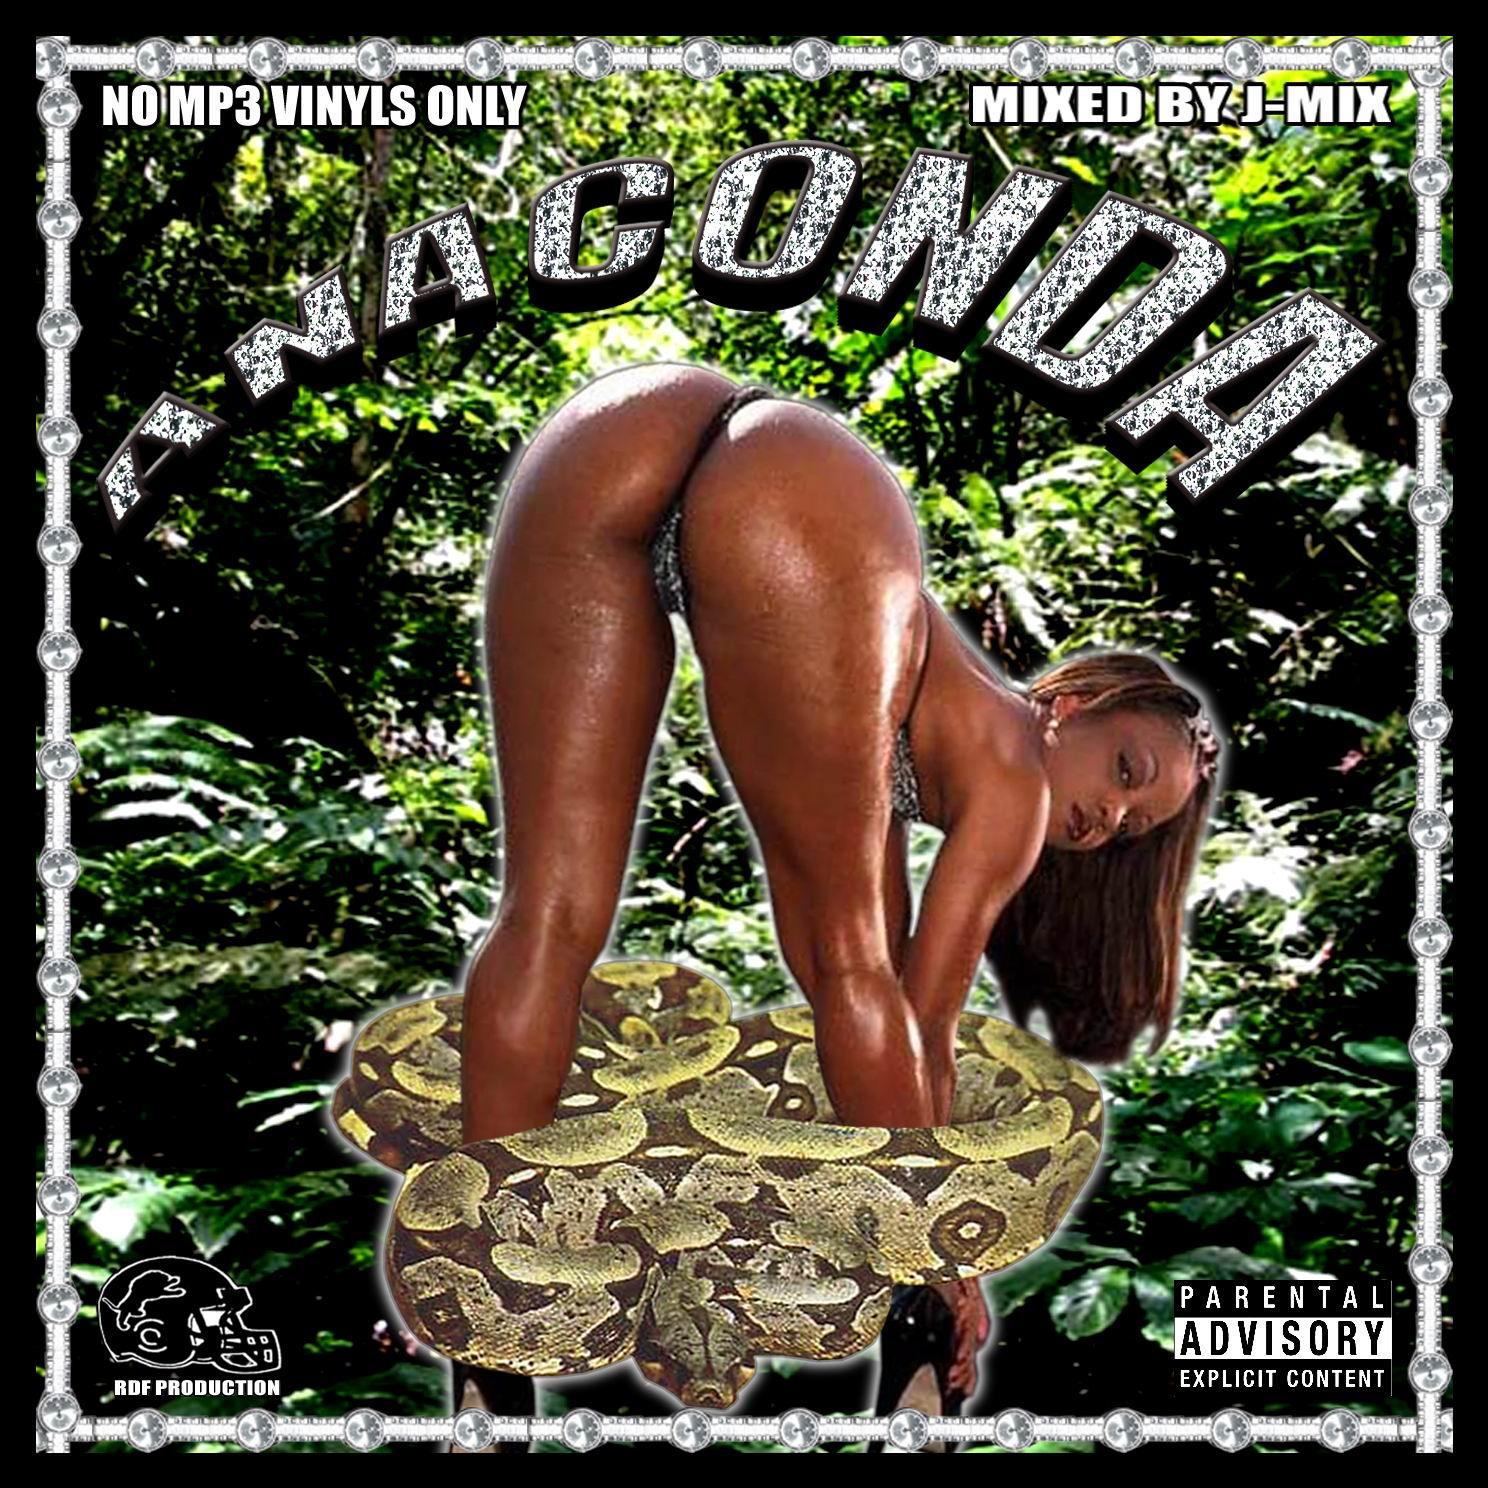 Anaconda mix tape